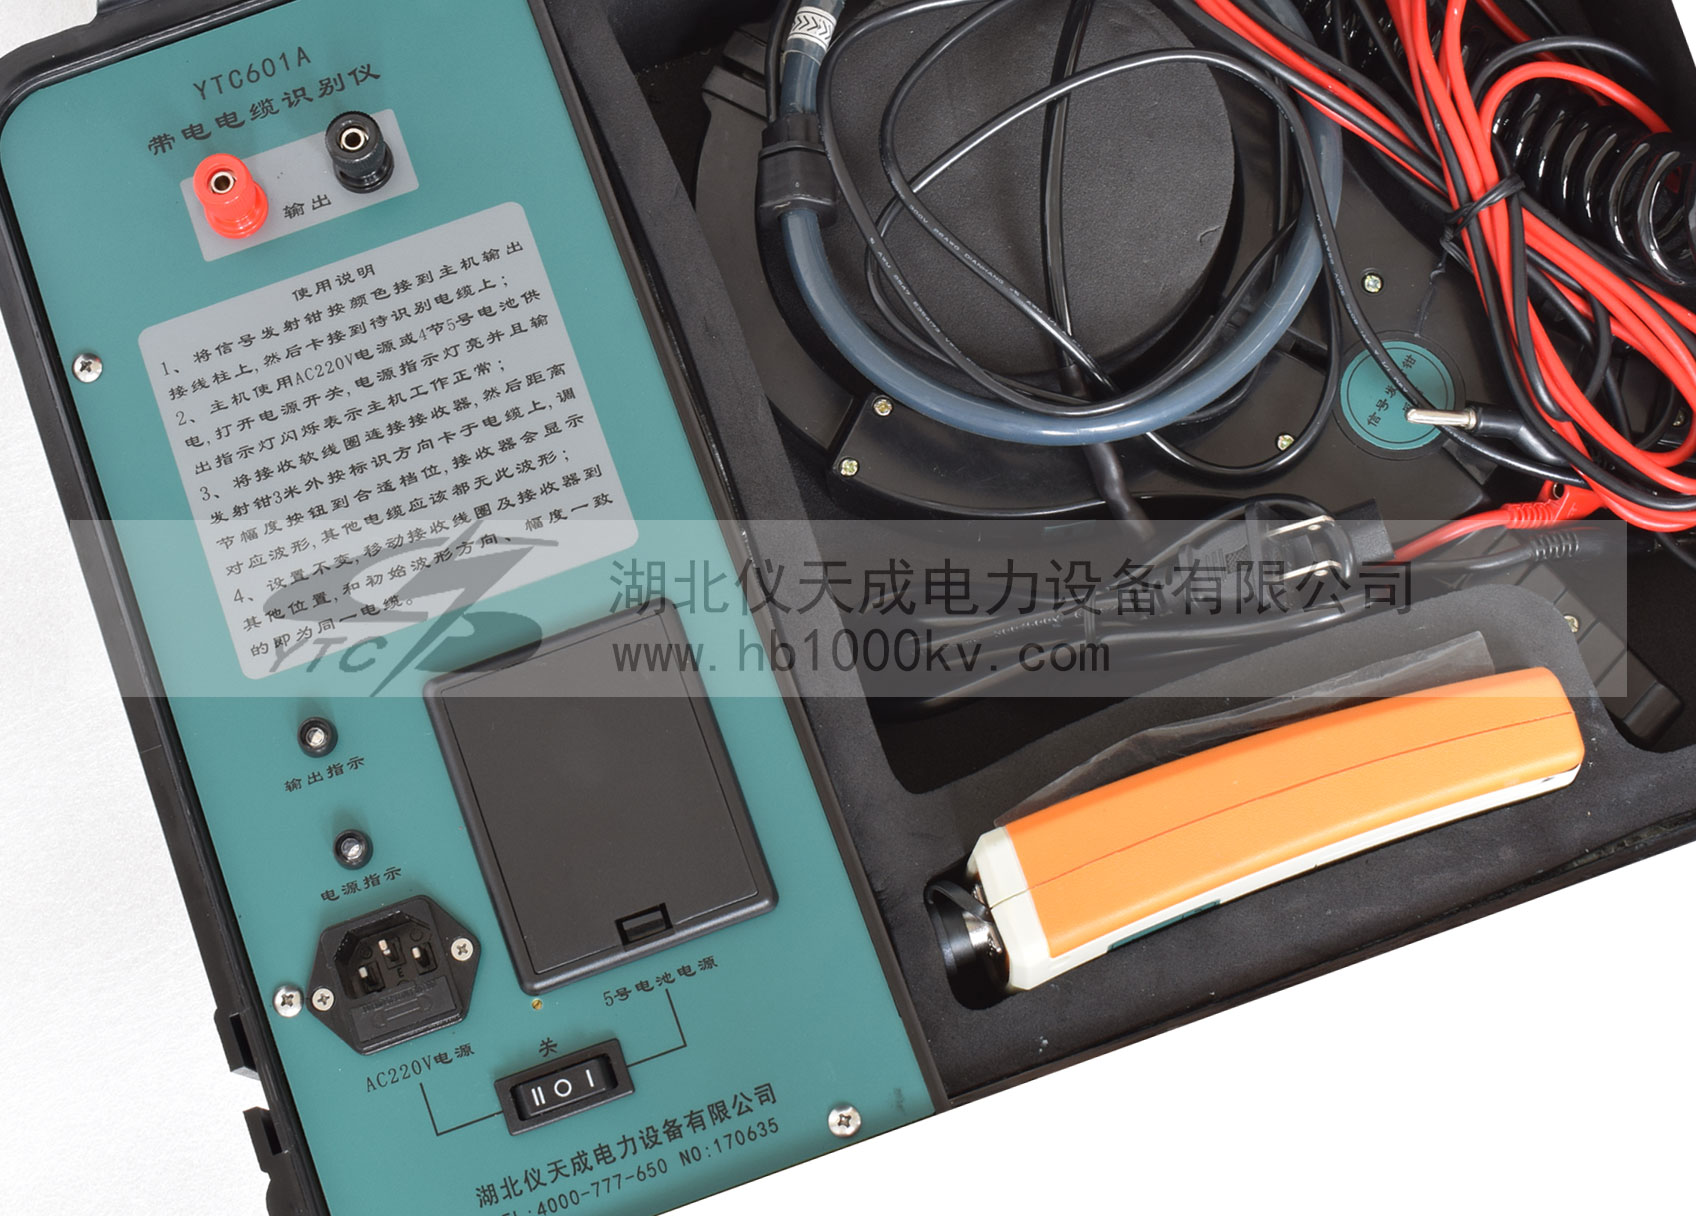 YTC601A带电电缆识别仪面板图